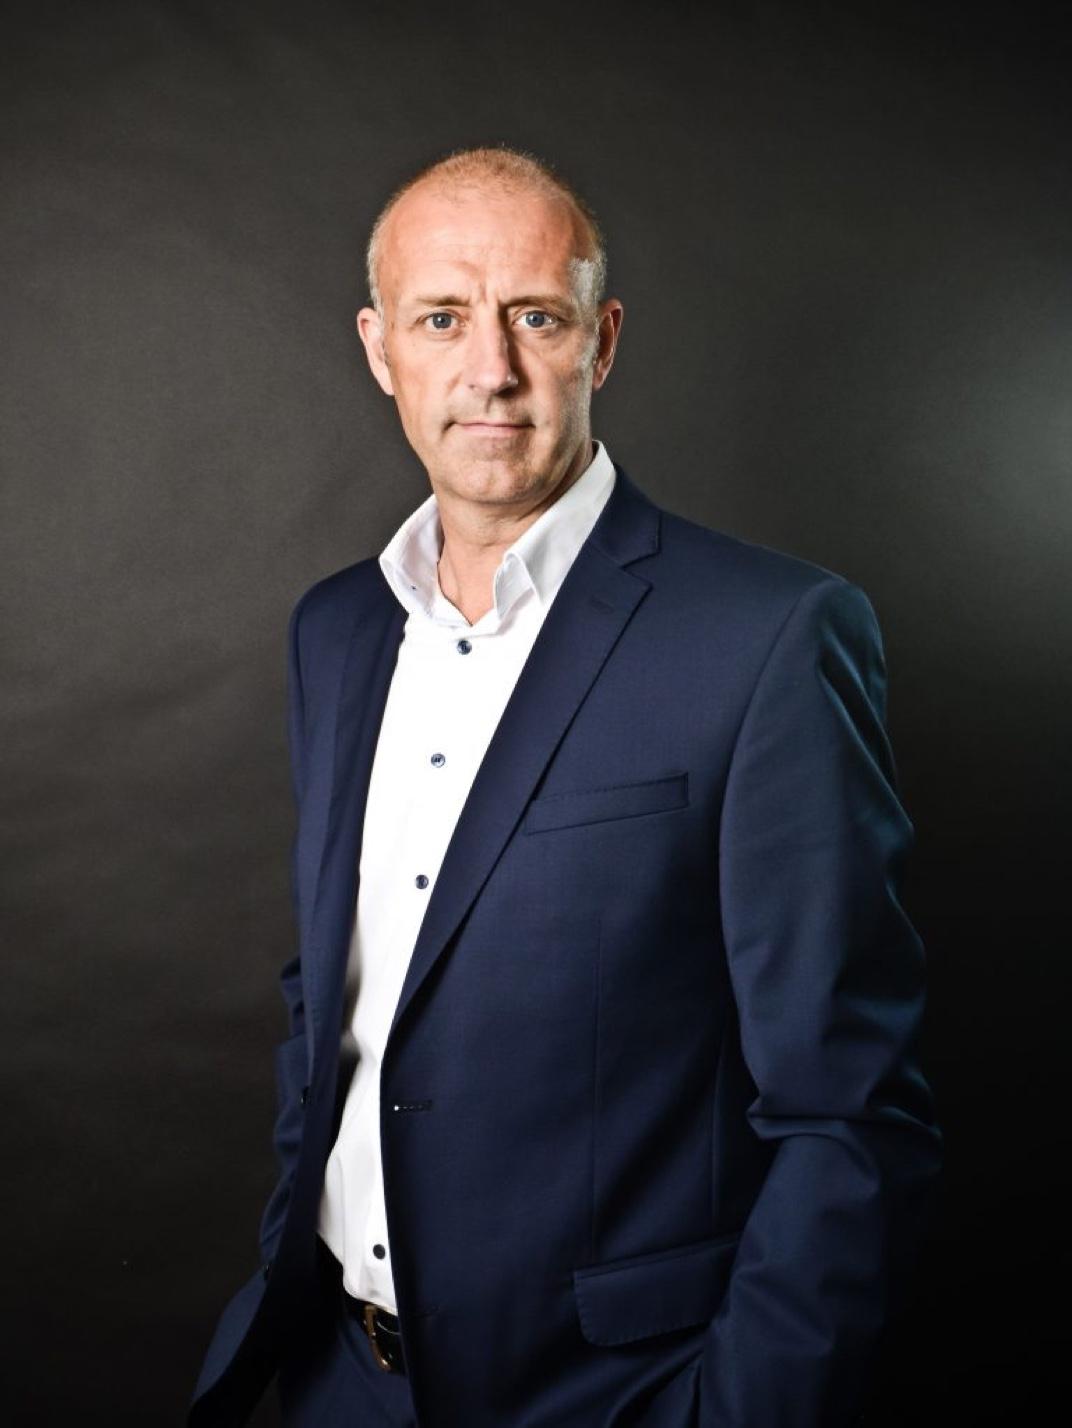 Paul Bailey – BWF President